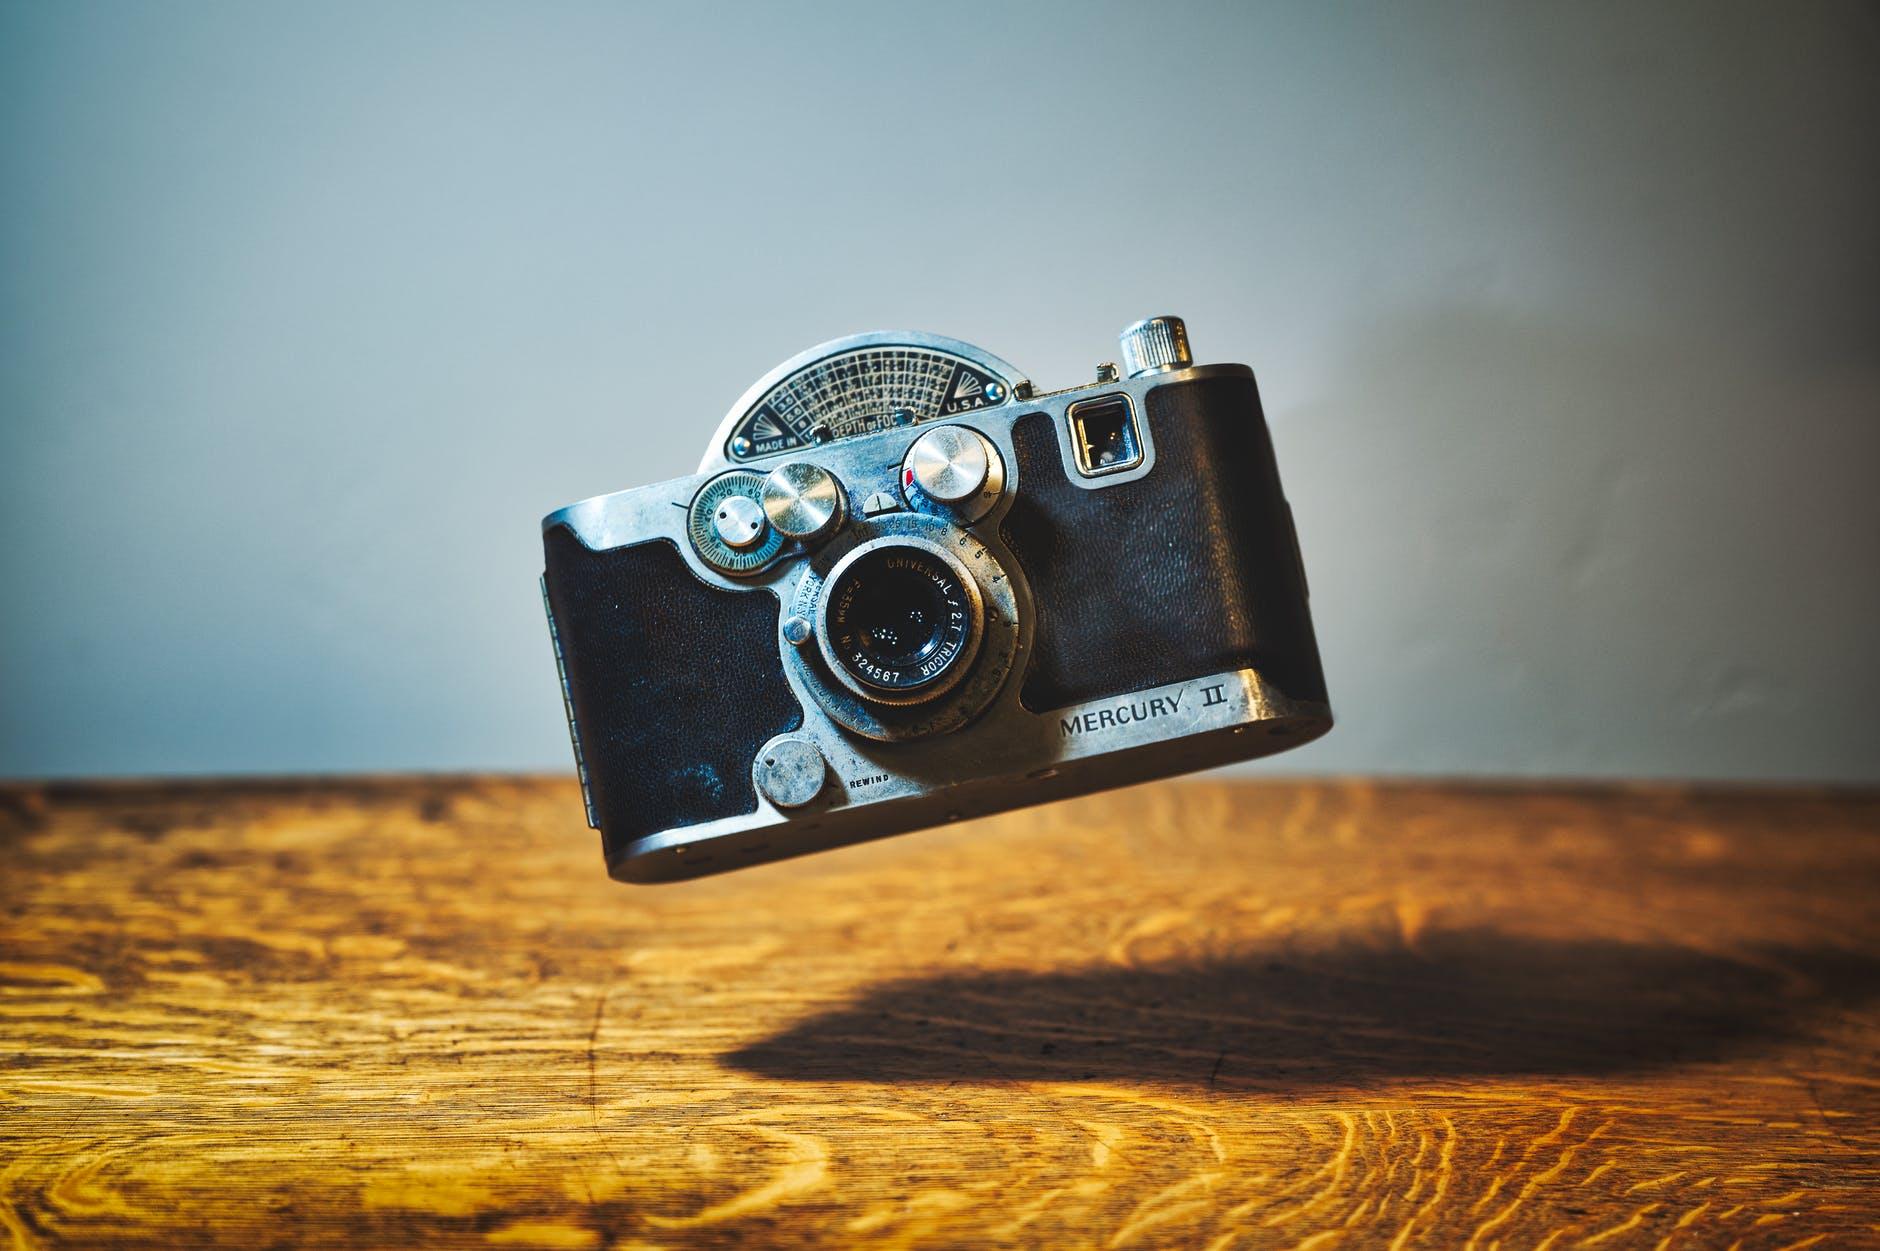 retro photo camera above wooden table